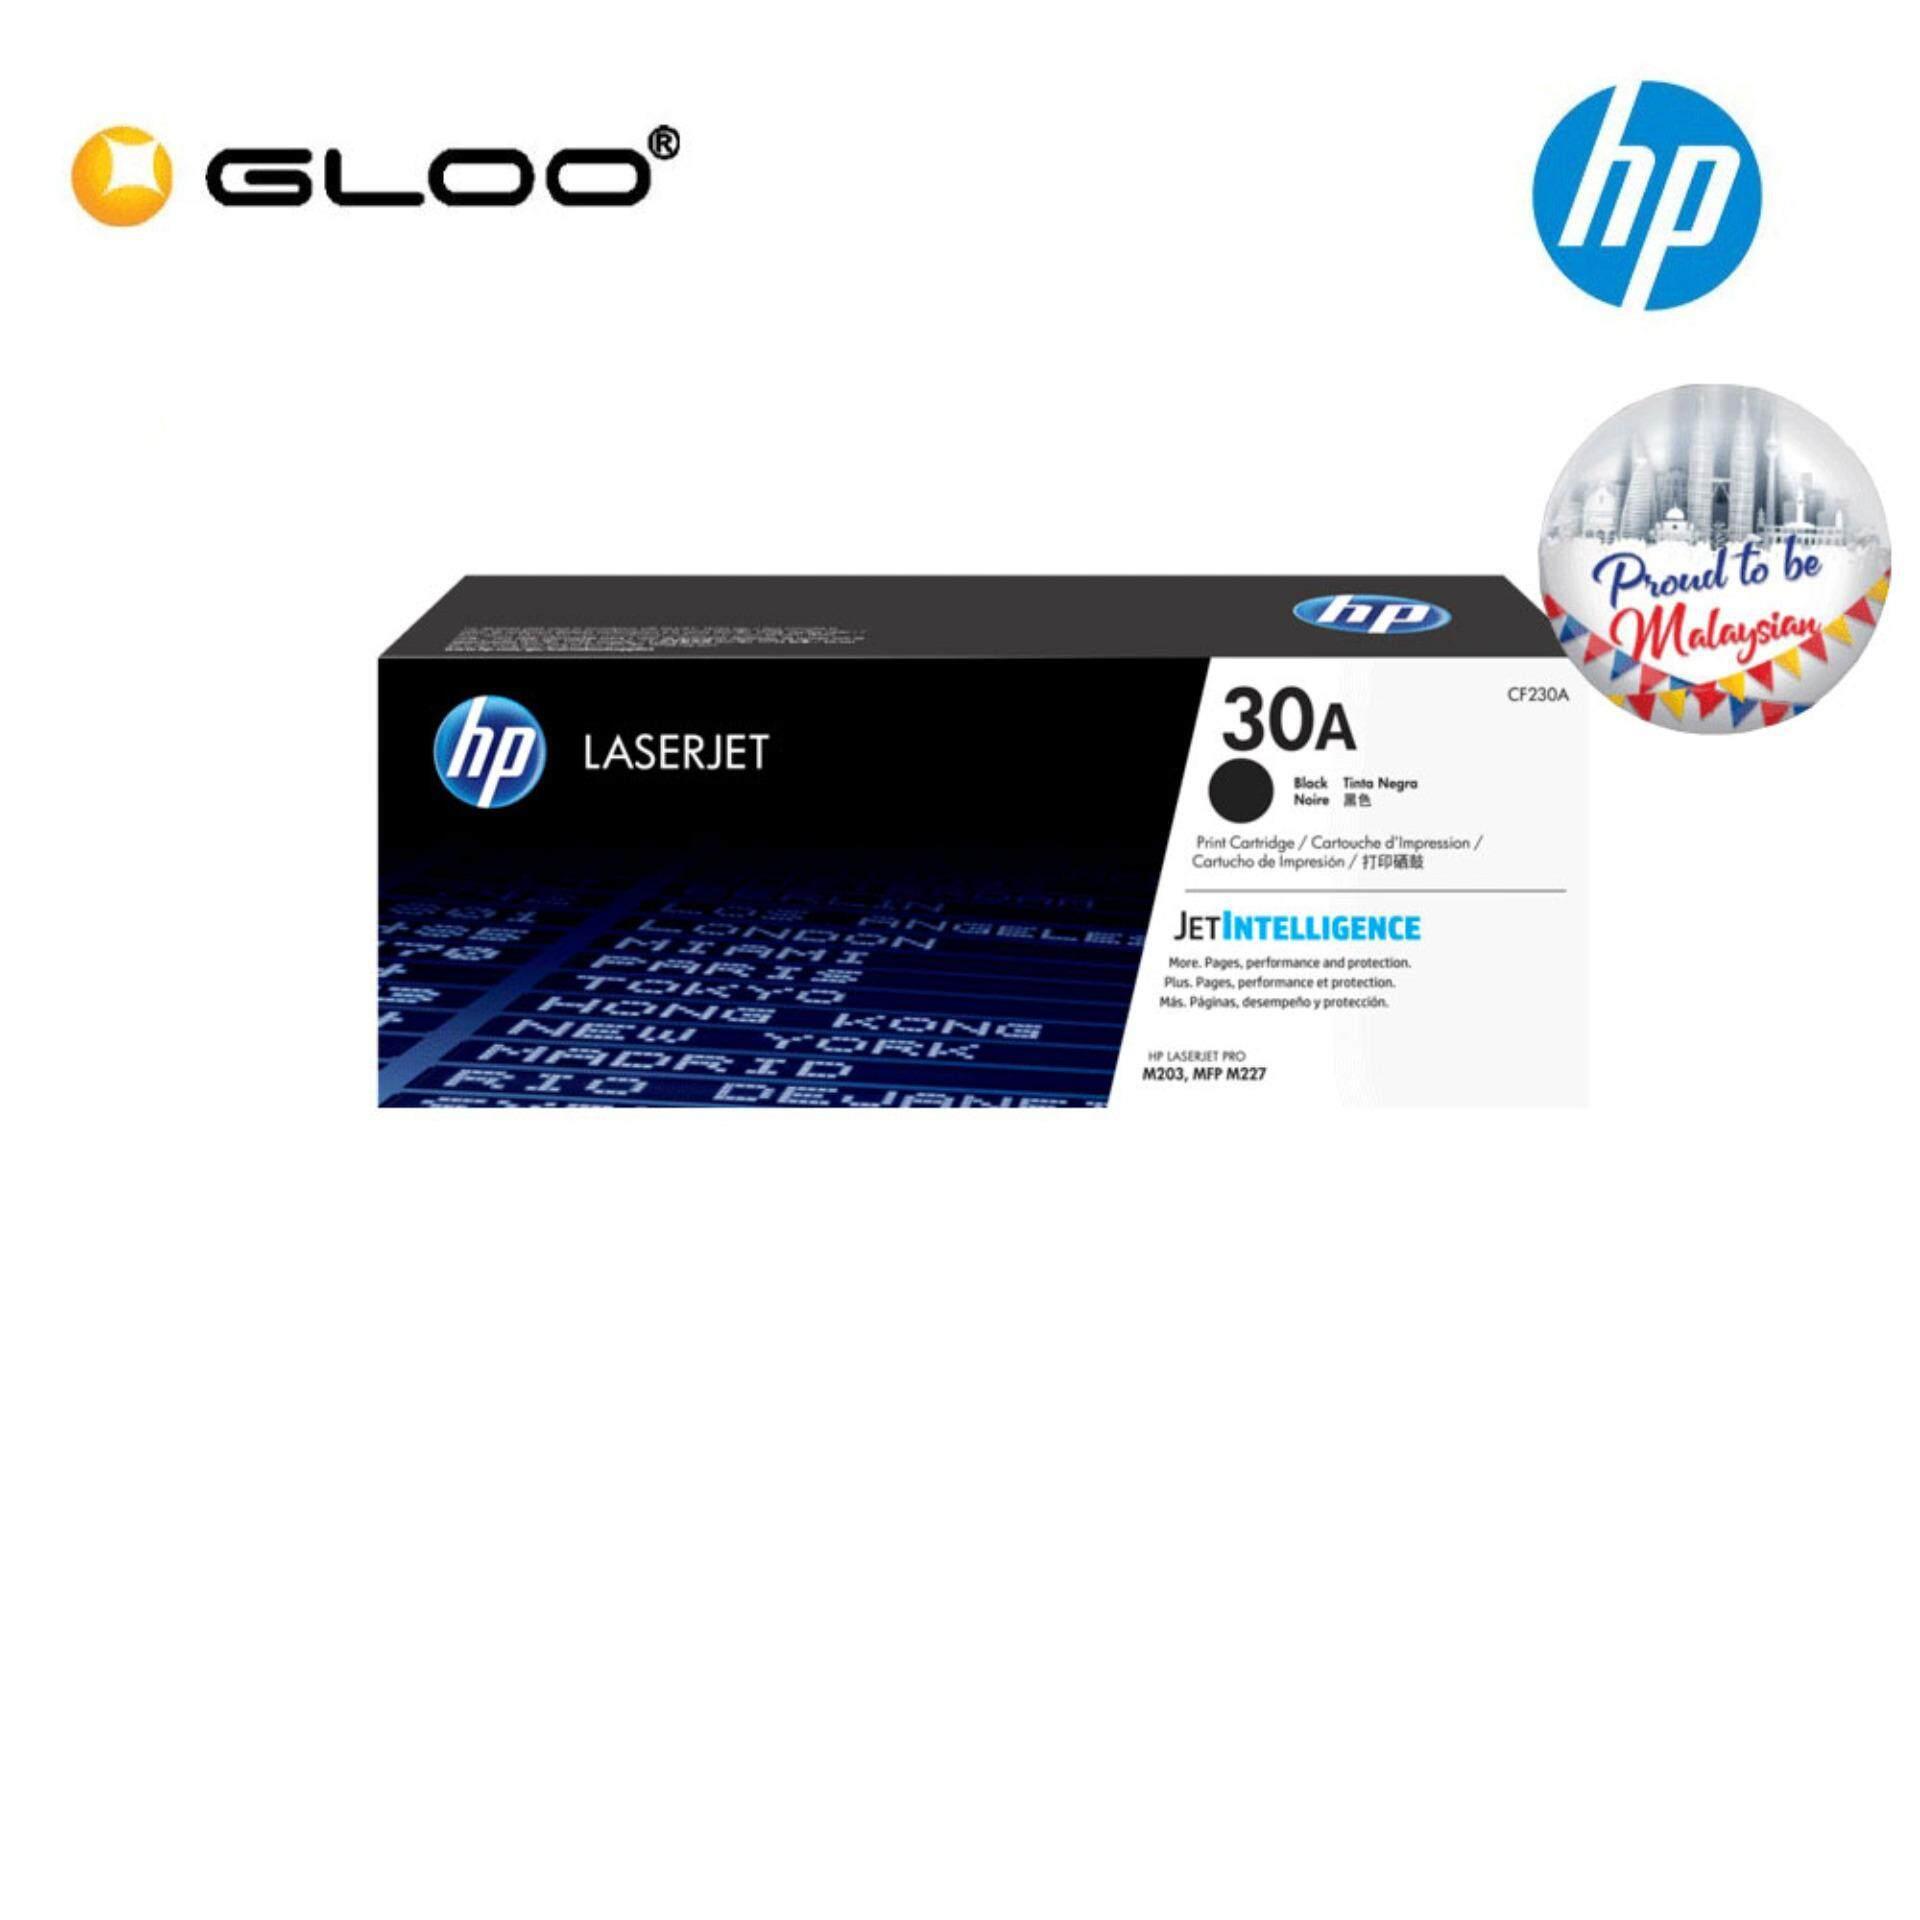 HP 30A Black Original LaserJet Toner Cartridge CF230A/ HP LaserJet Pro M203d/ M203dn/ M203dw/ HP LaserJet Pro MFP M227fdn/ M227fdw/ M227sdn [REDEMPTION] Touch & GO/Boost E- voucher worth RM30 *16th Aug-20th Oct 2019*